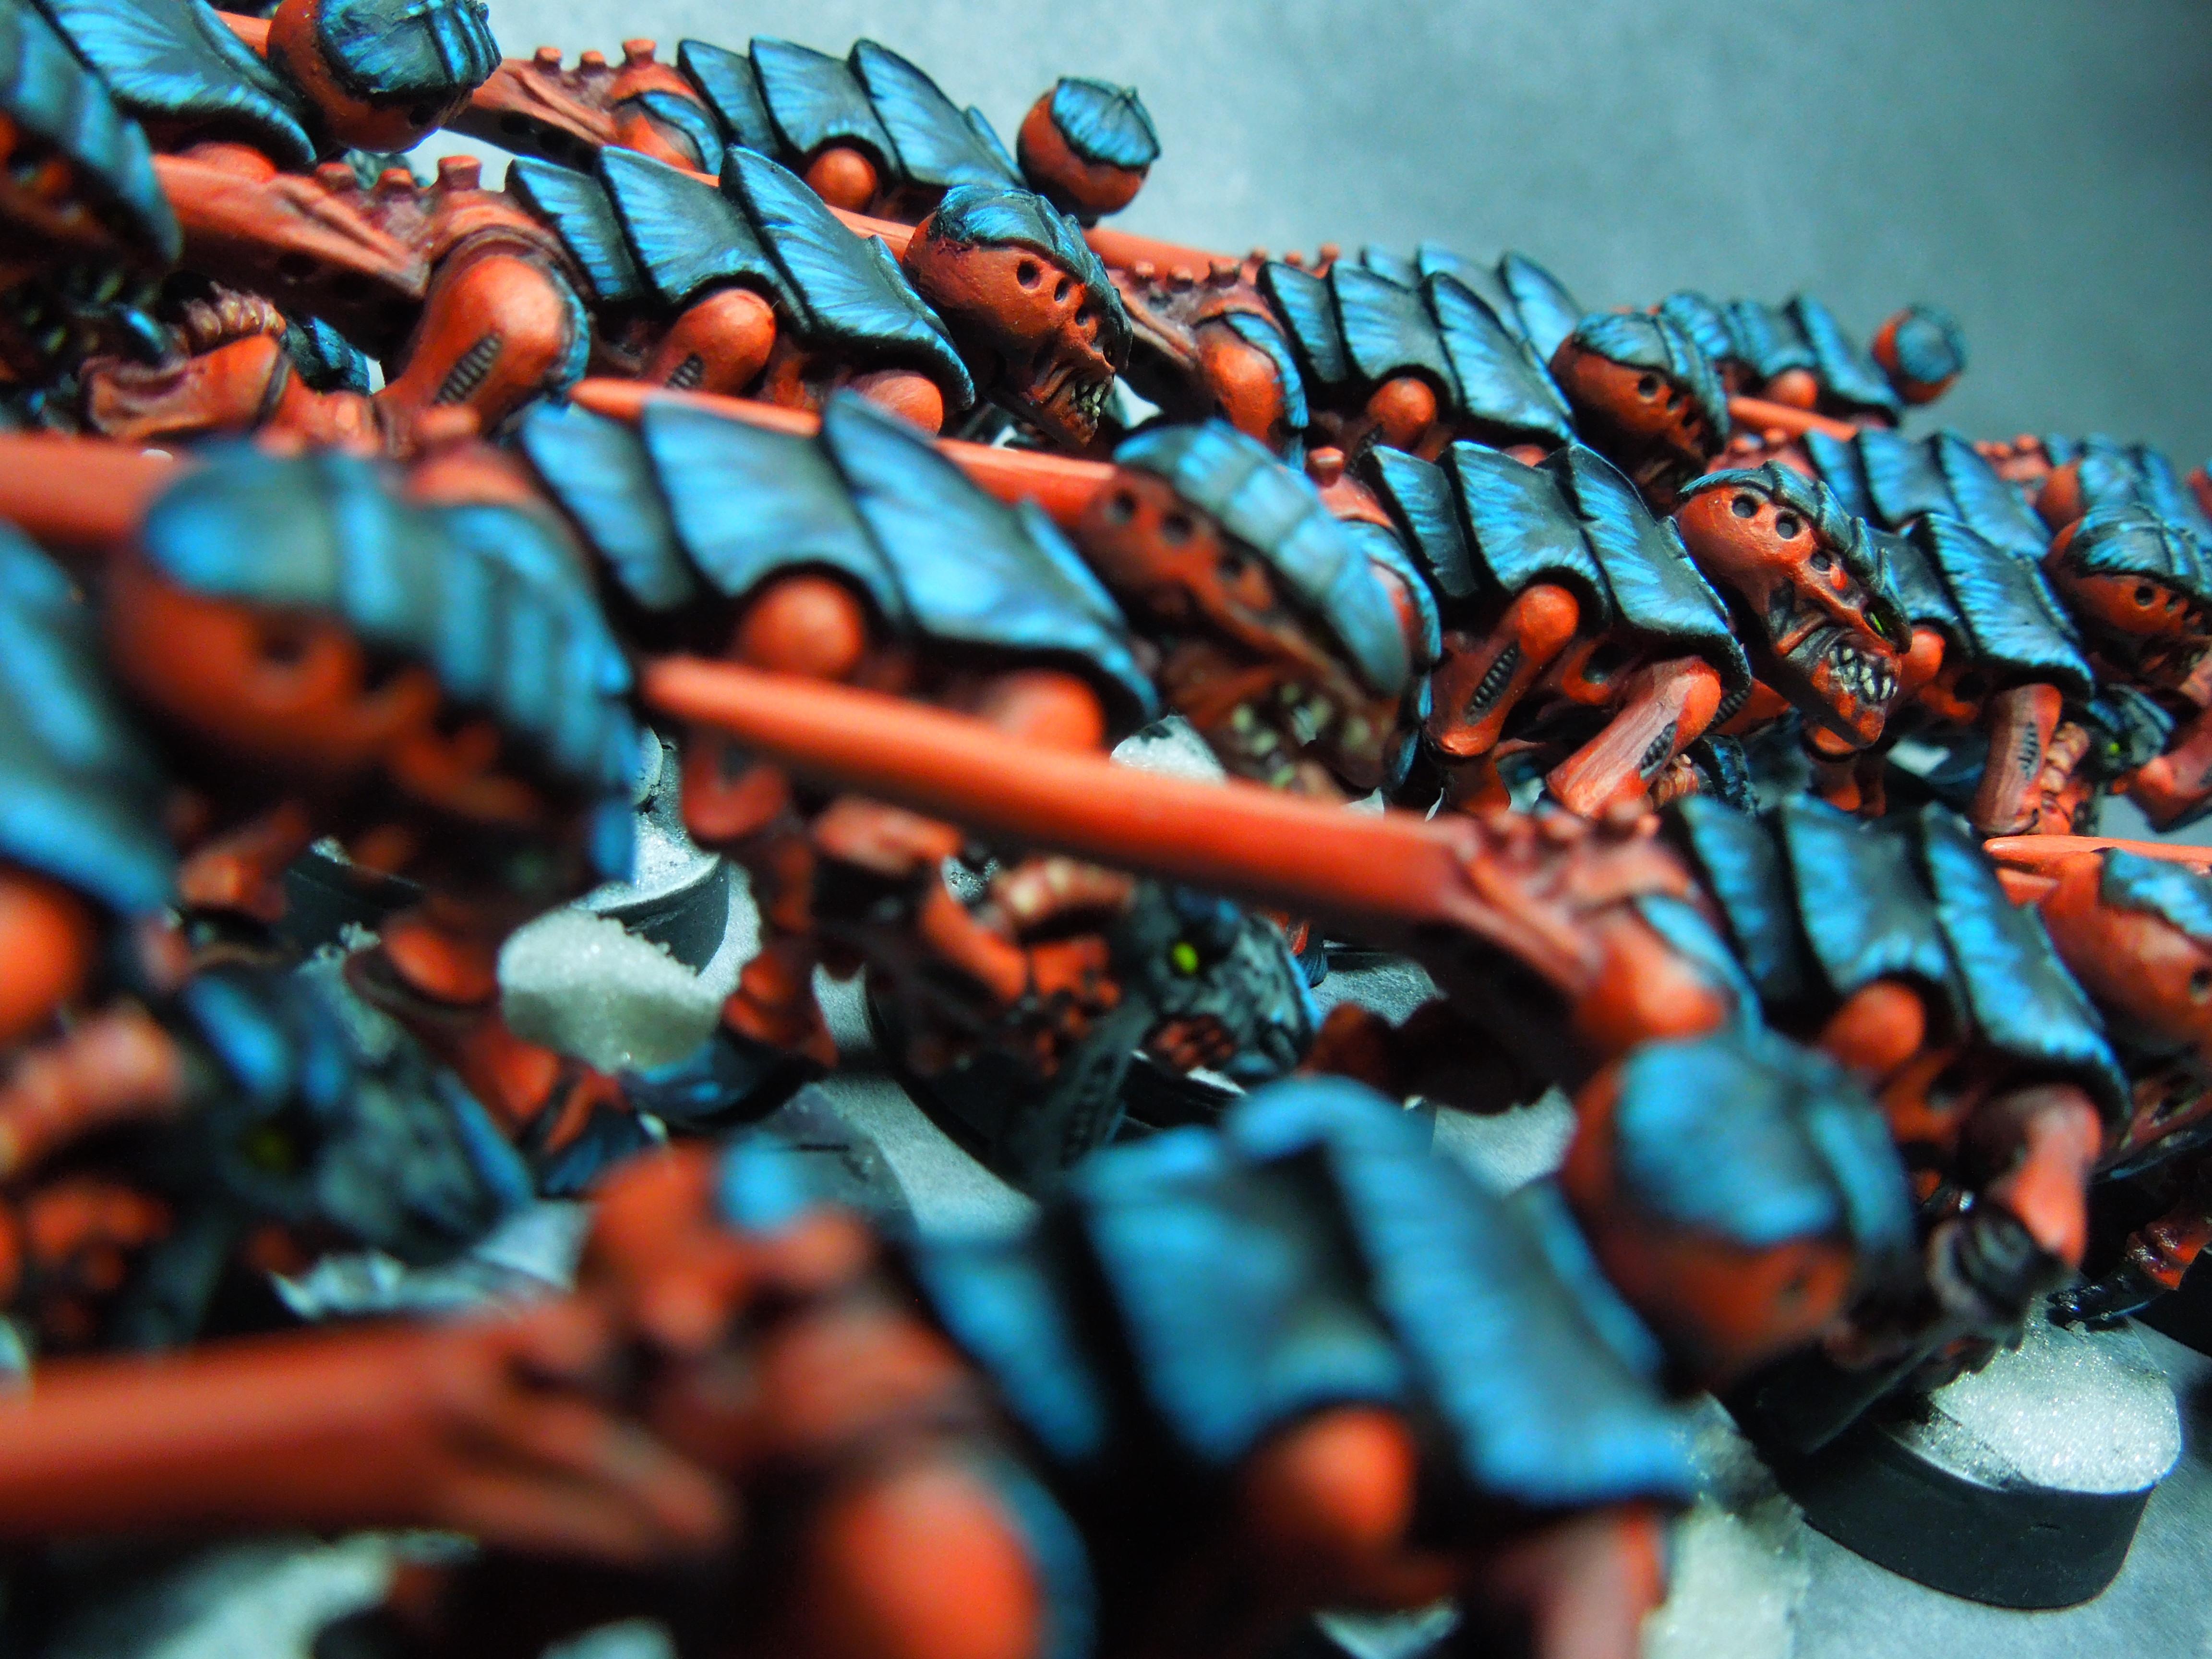 Behemoth, Bugs, Gants, Nids, Nova, Termagants, Tyranids